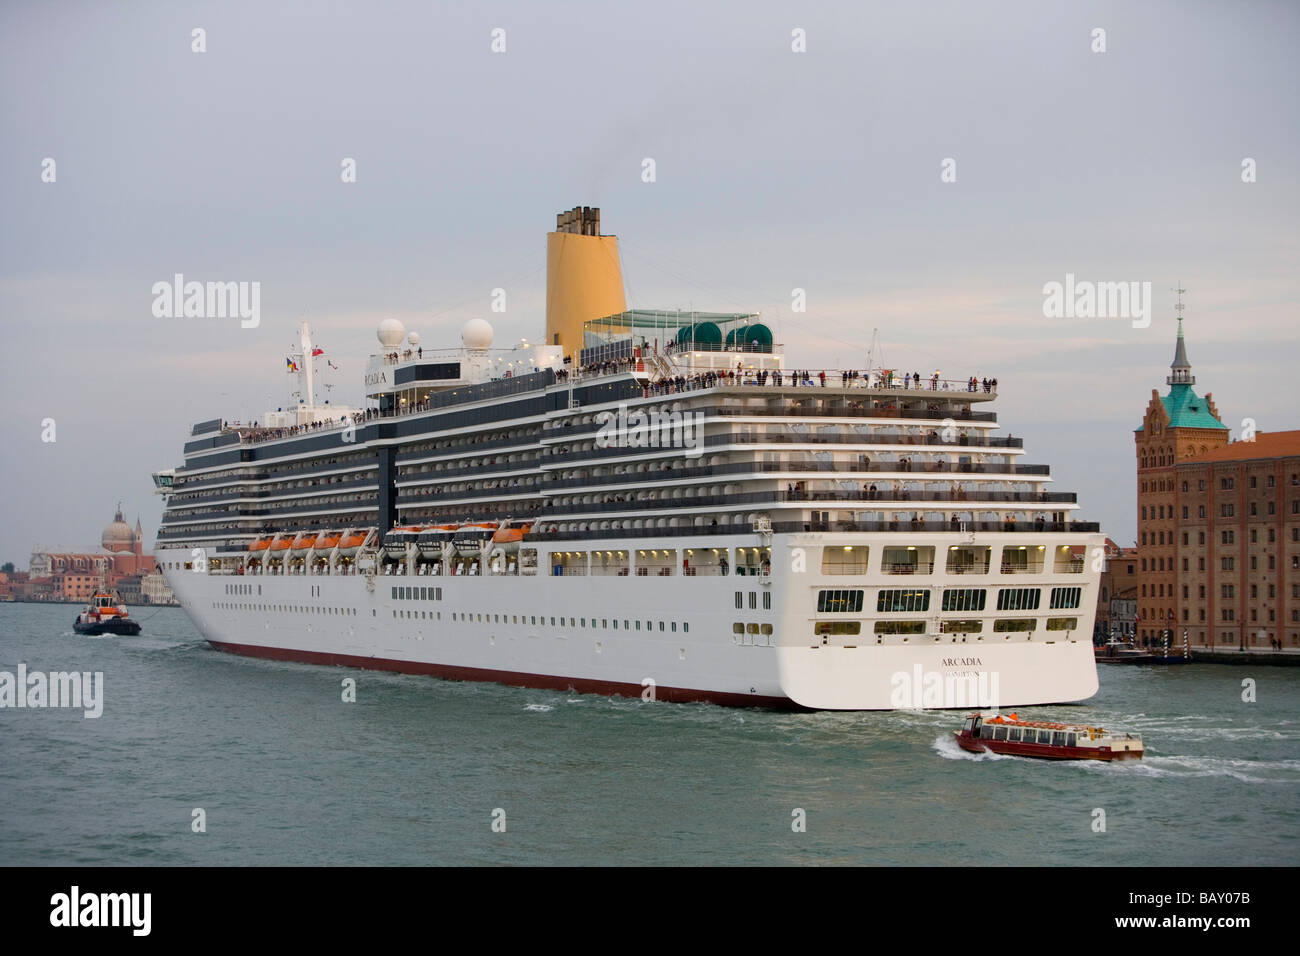 Cruiseship MS Arcadia (PandO Cruises) departing from Port of Venice at sunset, Venice, Veneto, Italy - Stock Image